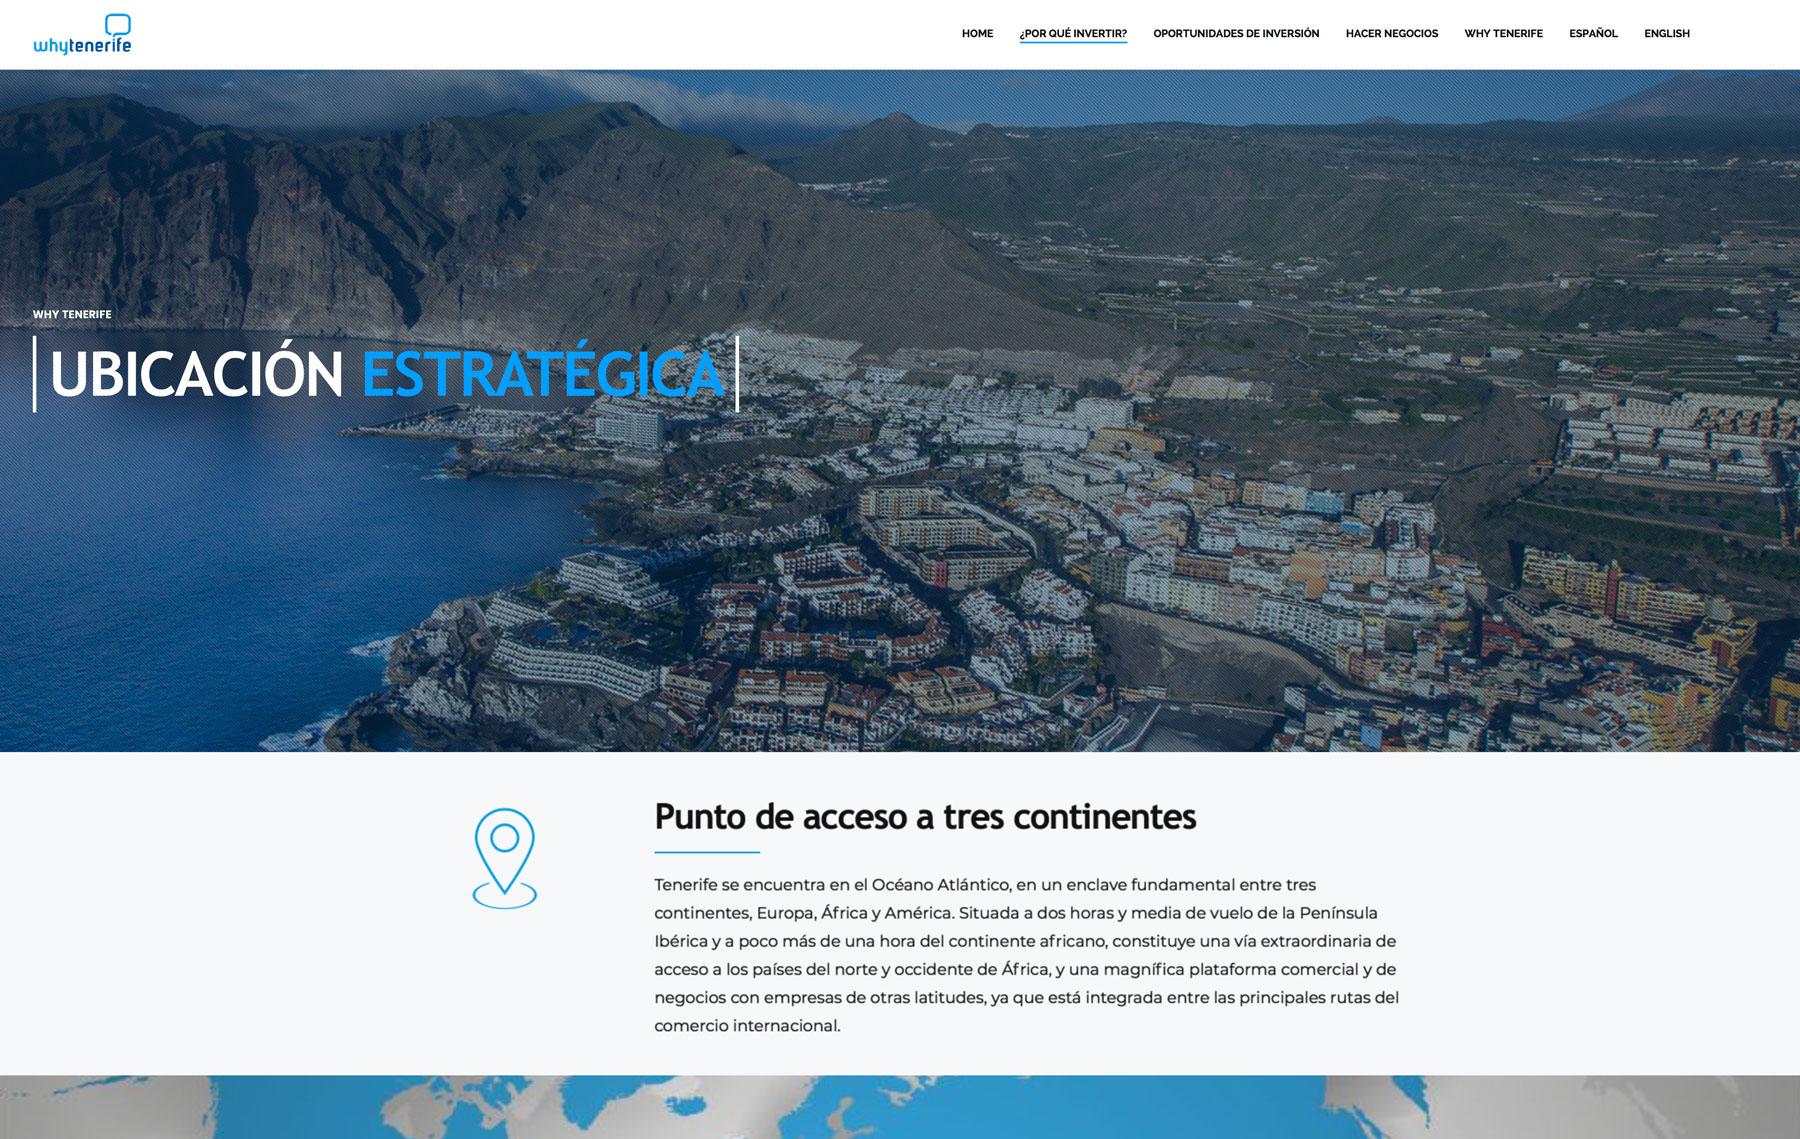 Turismo de Tenerife (web)